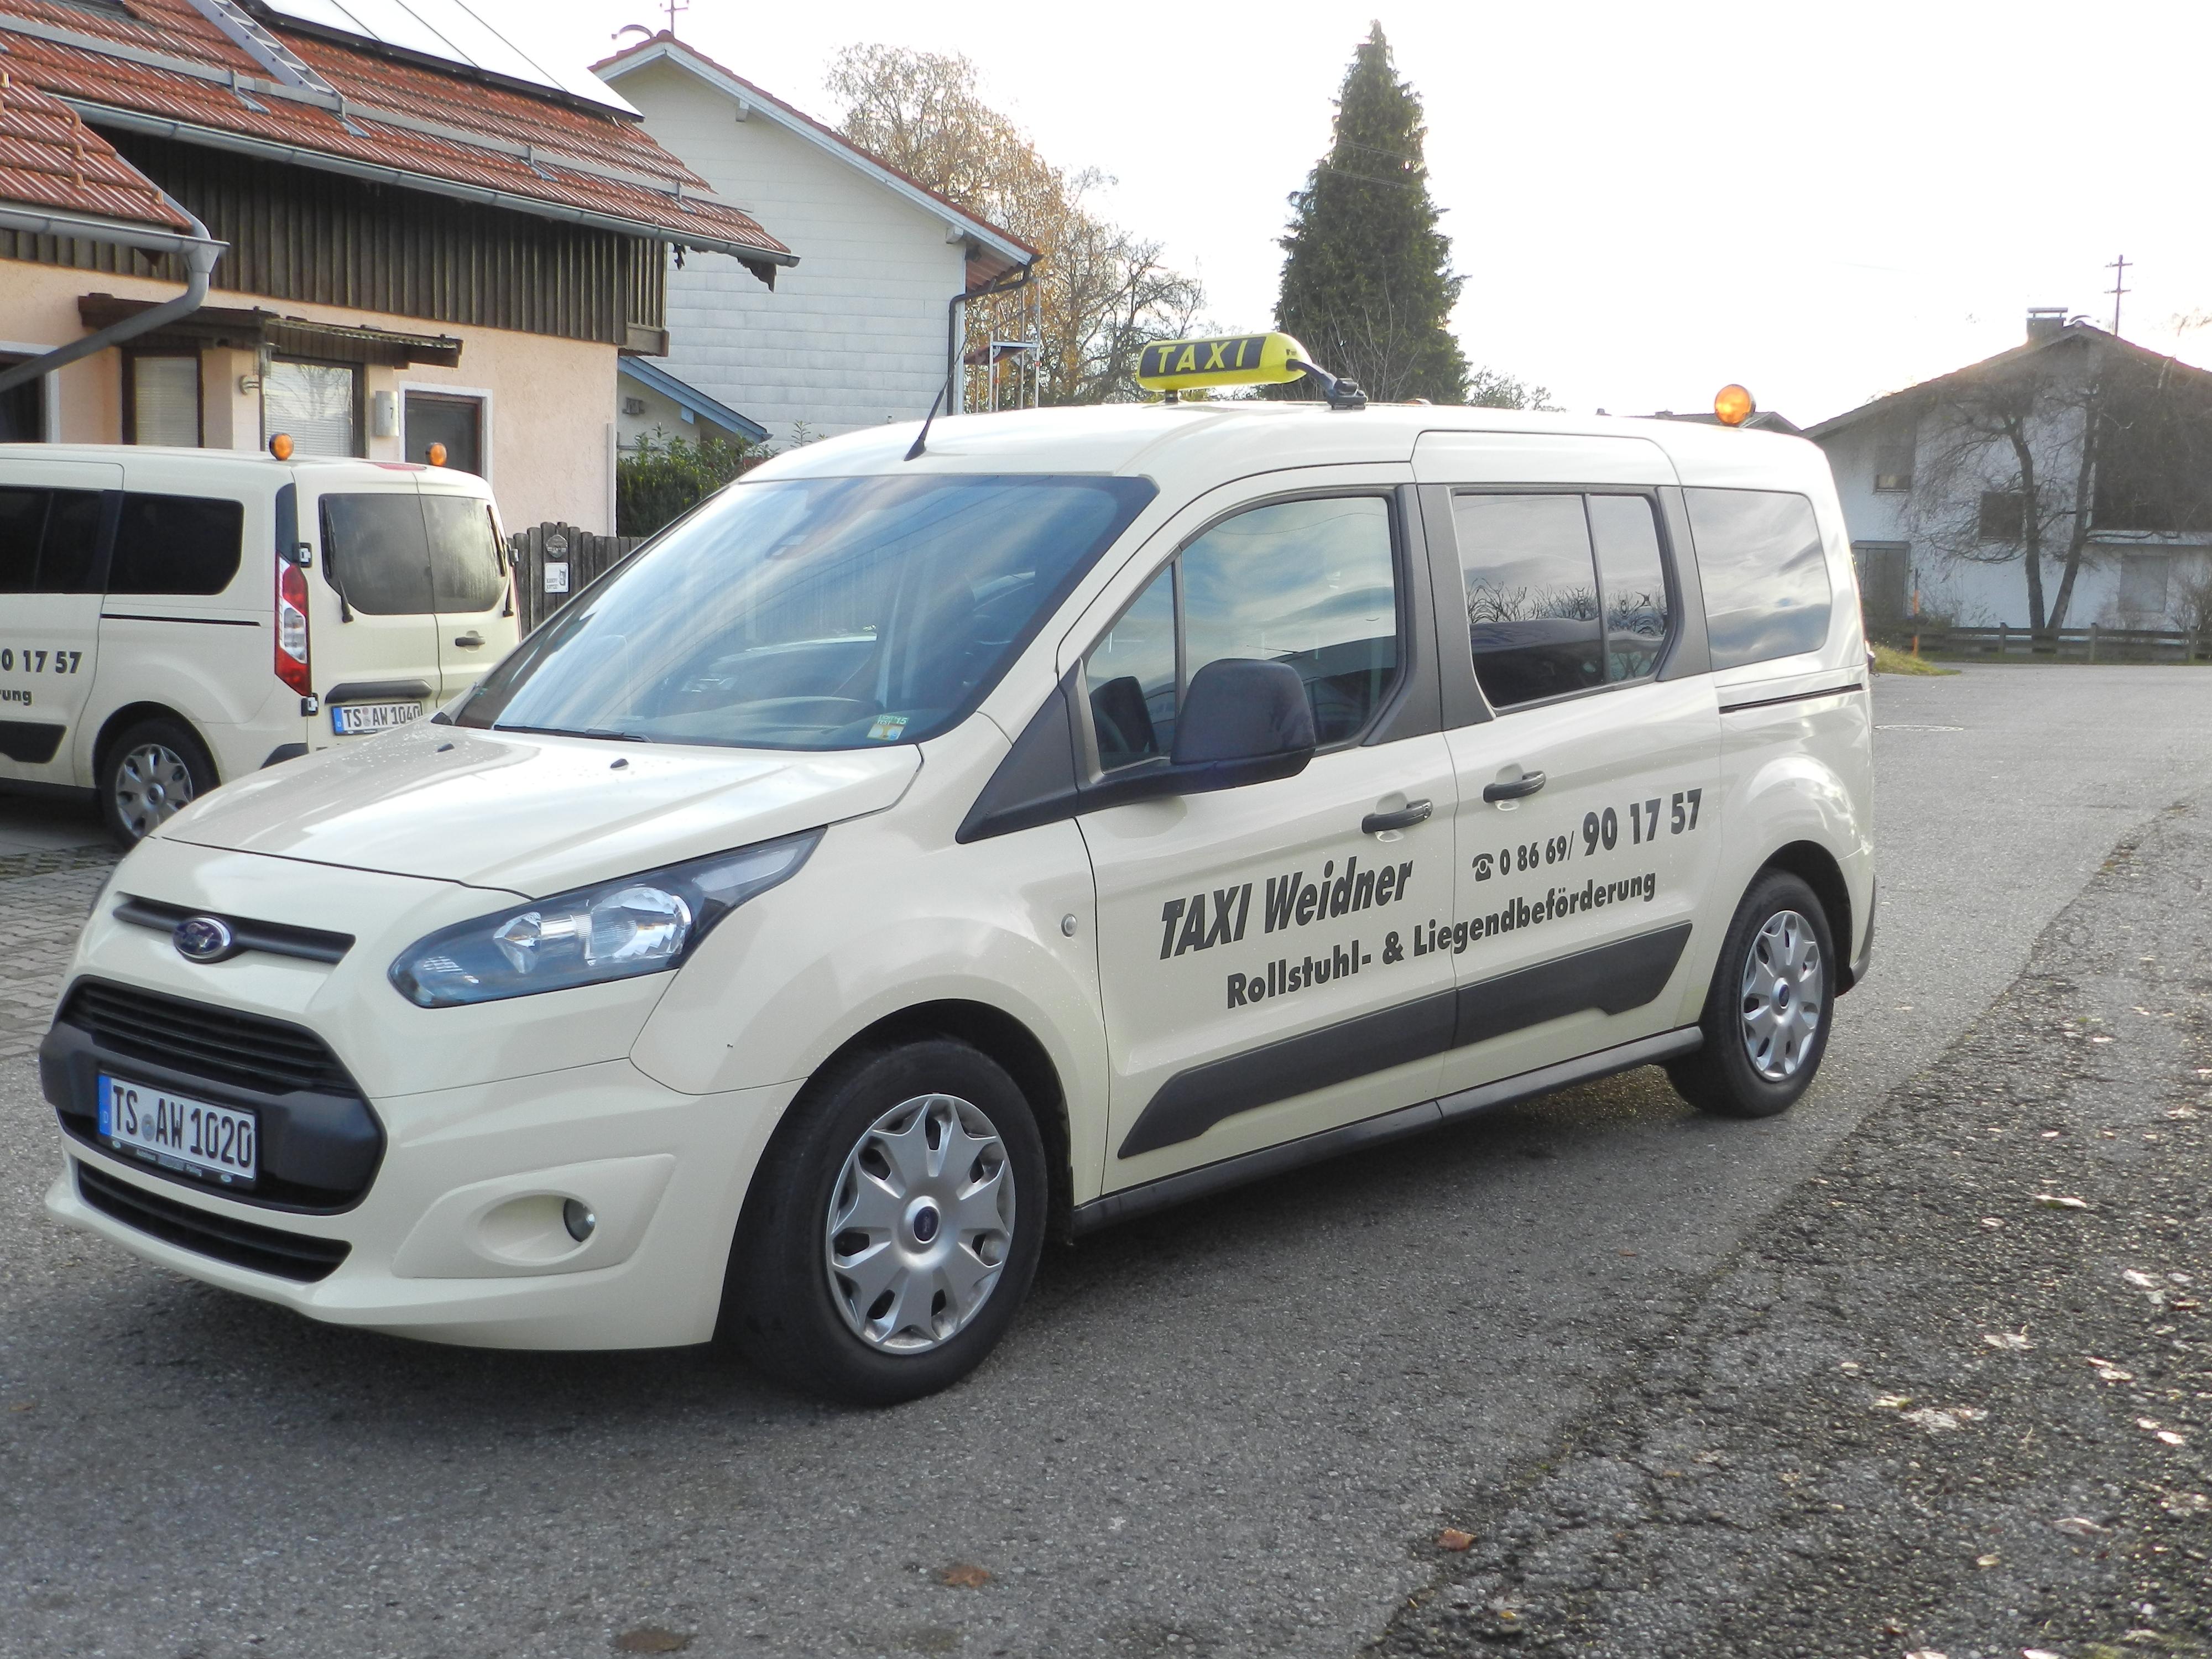 Taxi & Fahrdienst Weidner GmbH & Co. KG